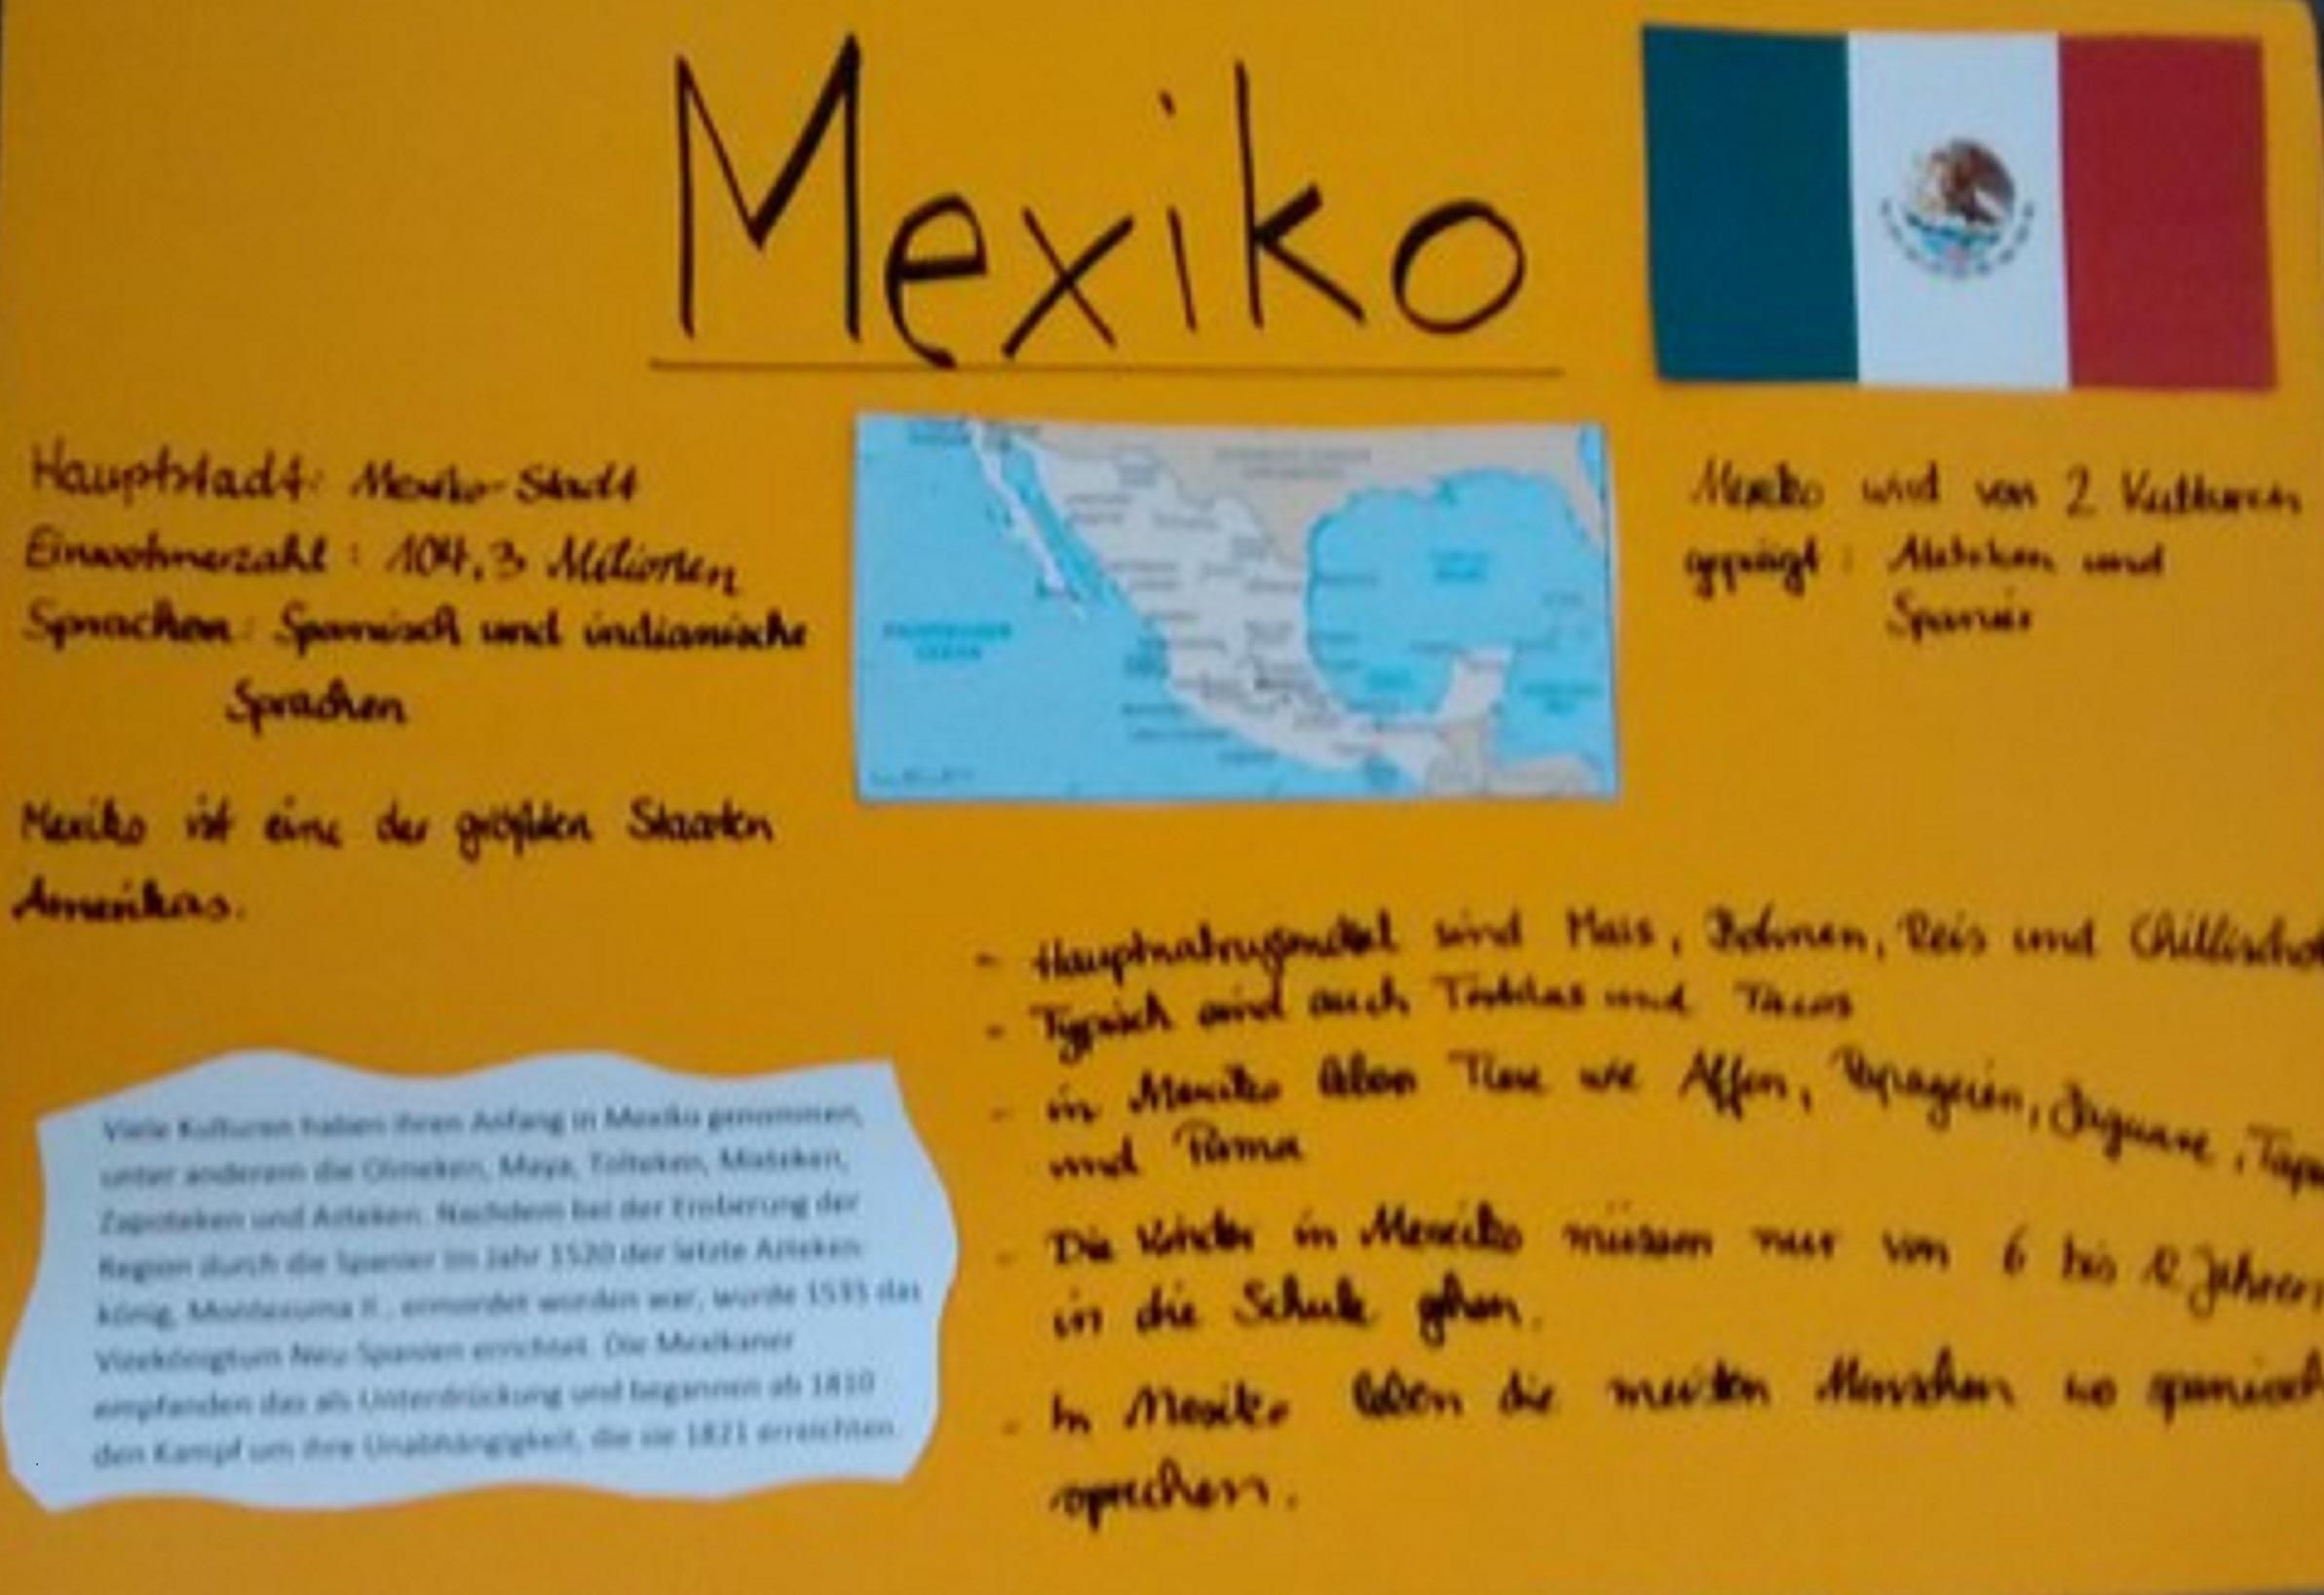 Plakat Mexiko